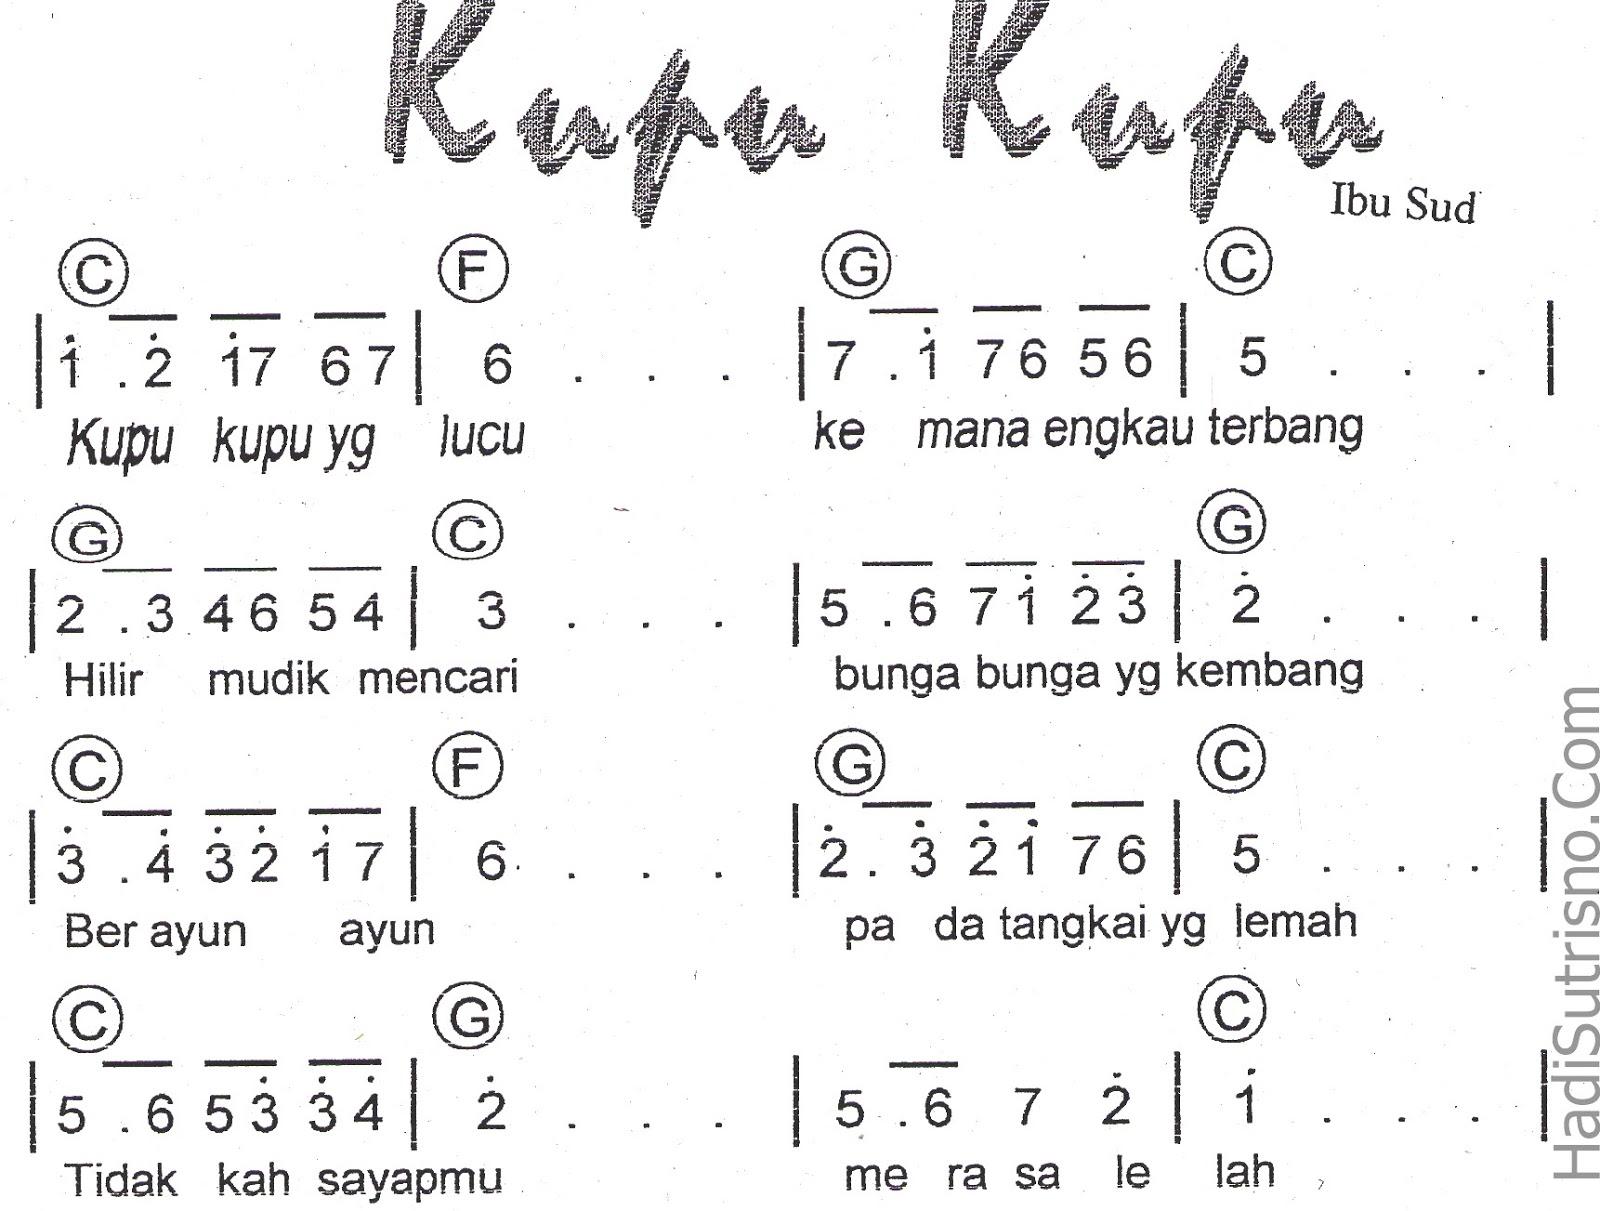 7 Koleksi Not angka Lagu anak-anak